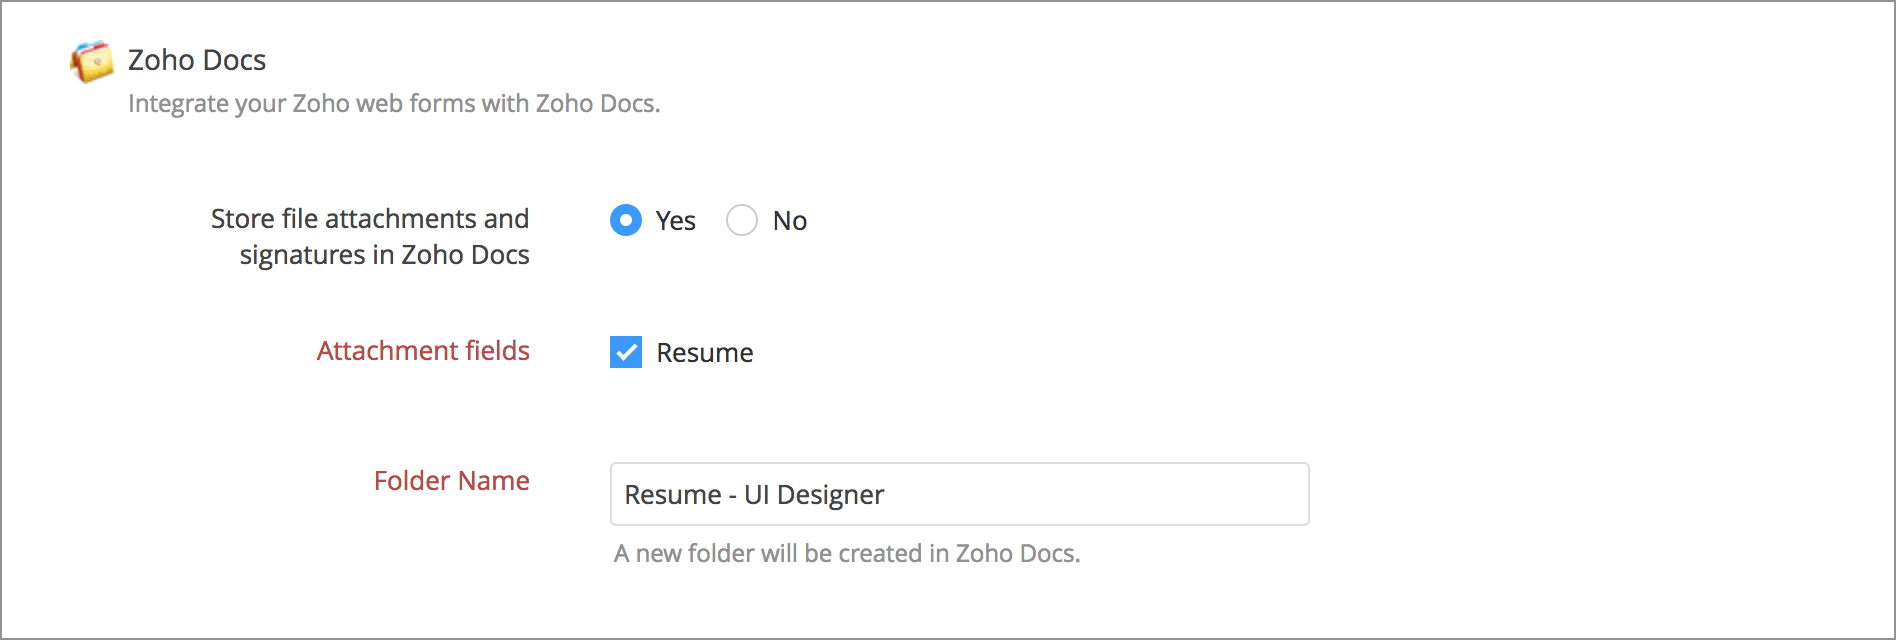 Zoho Spreadsheet Login Intended For Zoho Sheet Integration  Zoho Forms  User Guide Zoho Spreadsheet Login Spreadsheet Downloa Spreadsheet Downloa zoho spreadsheet login